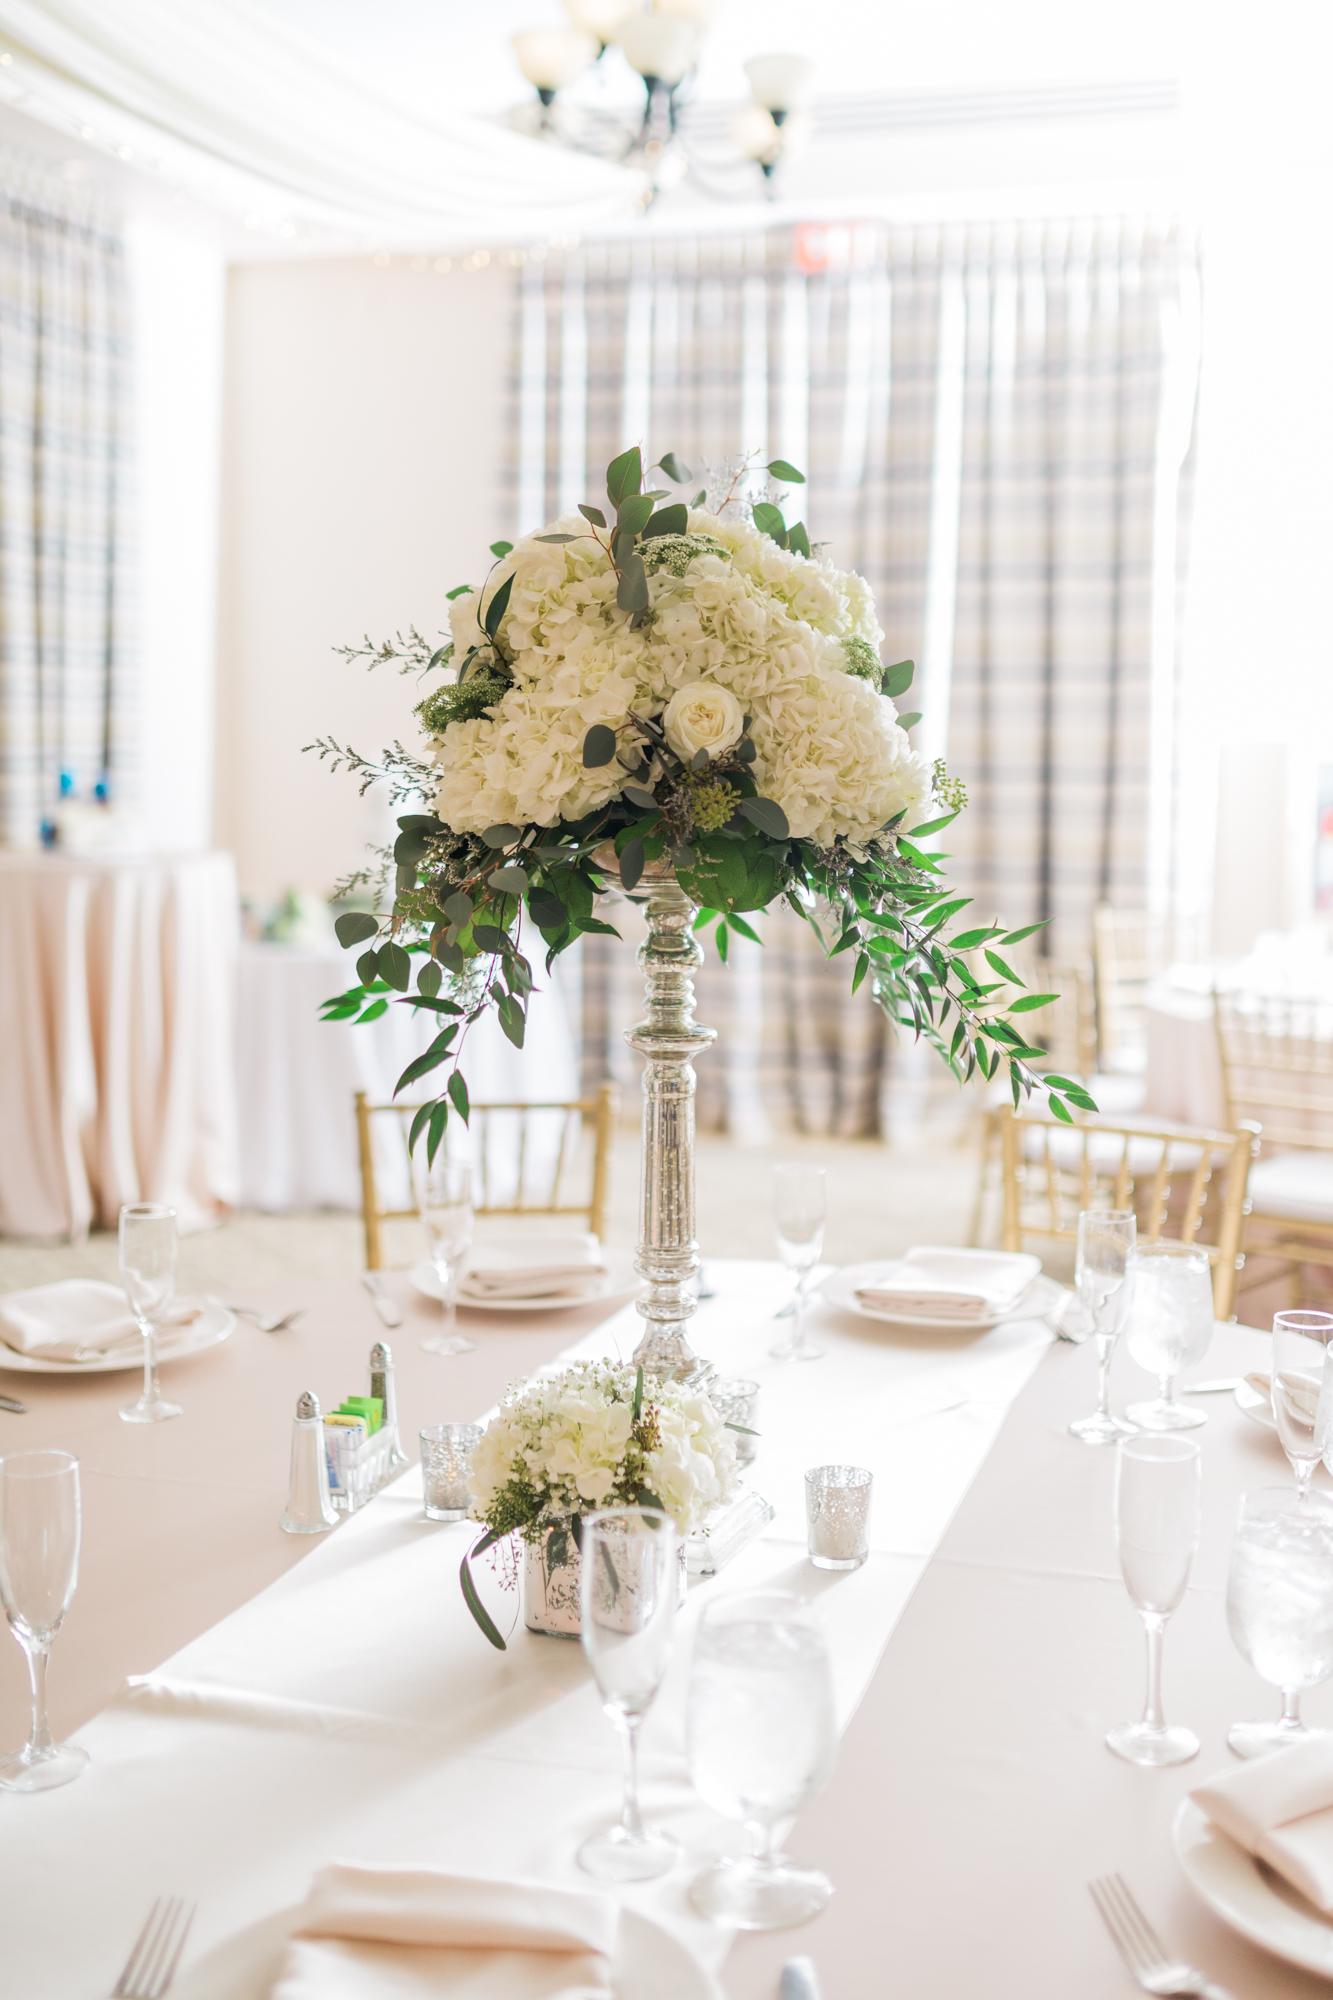 jessica-bellinger-photography-harmony-golf-preserve-wedding-photos-9435.jpg